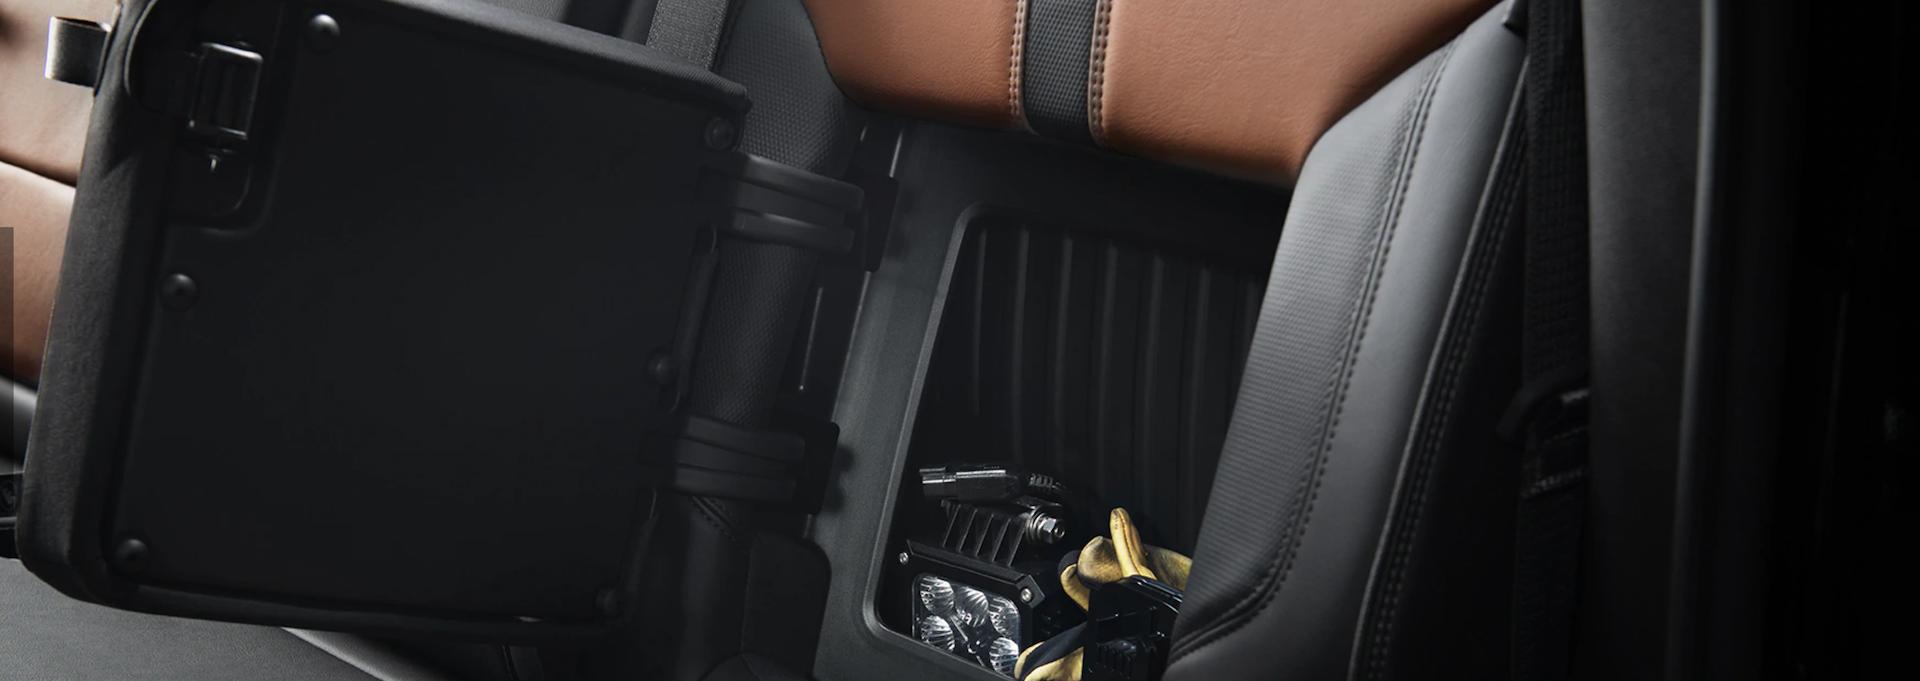 Hidden storage compartment in the New Chevy Silverado HD